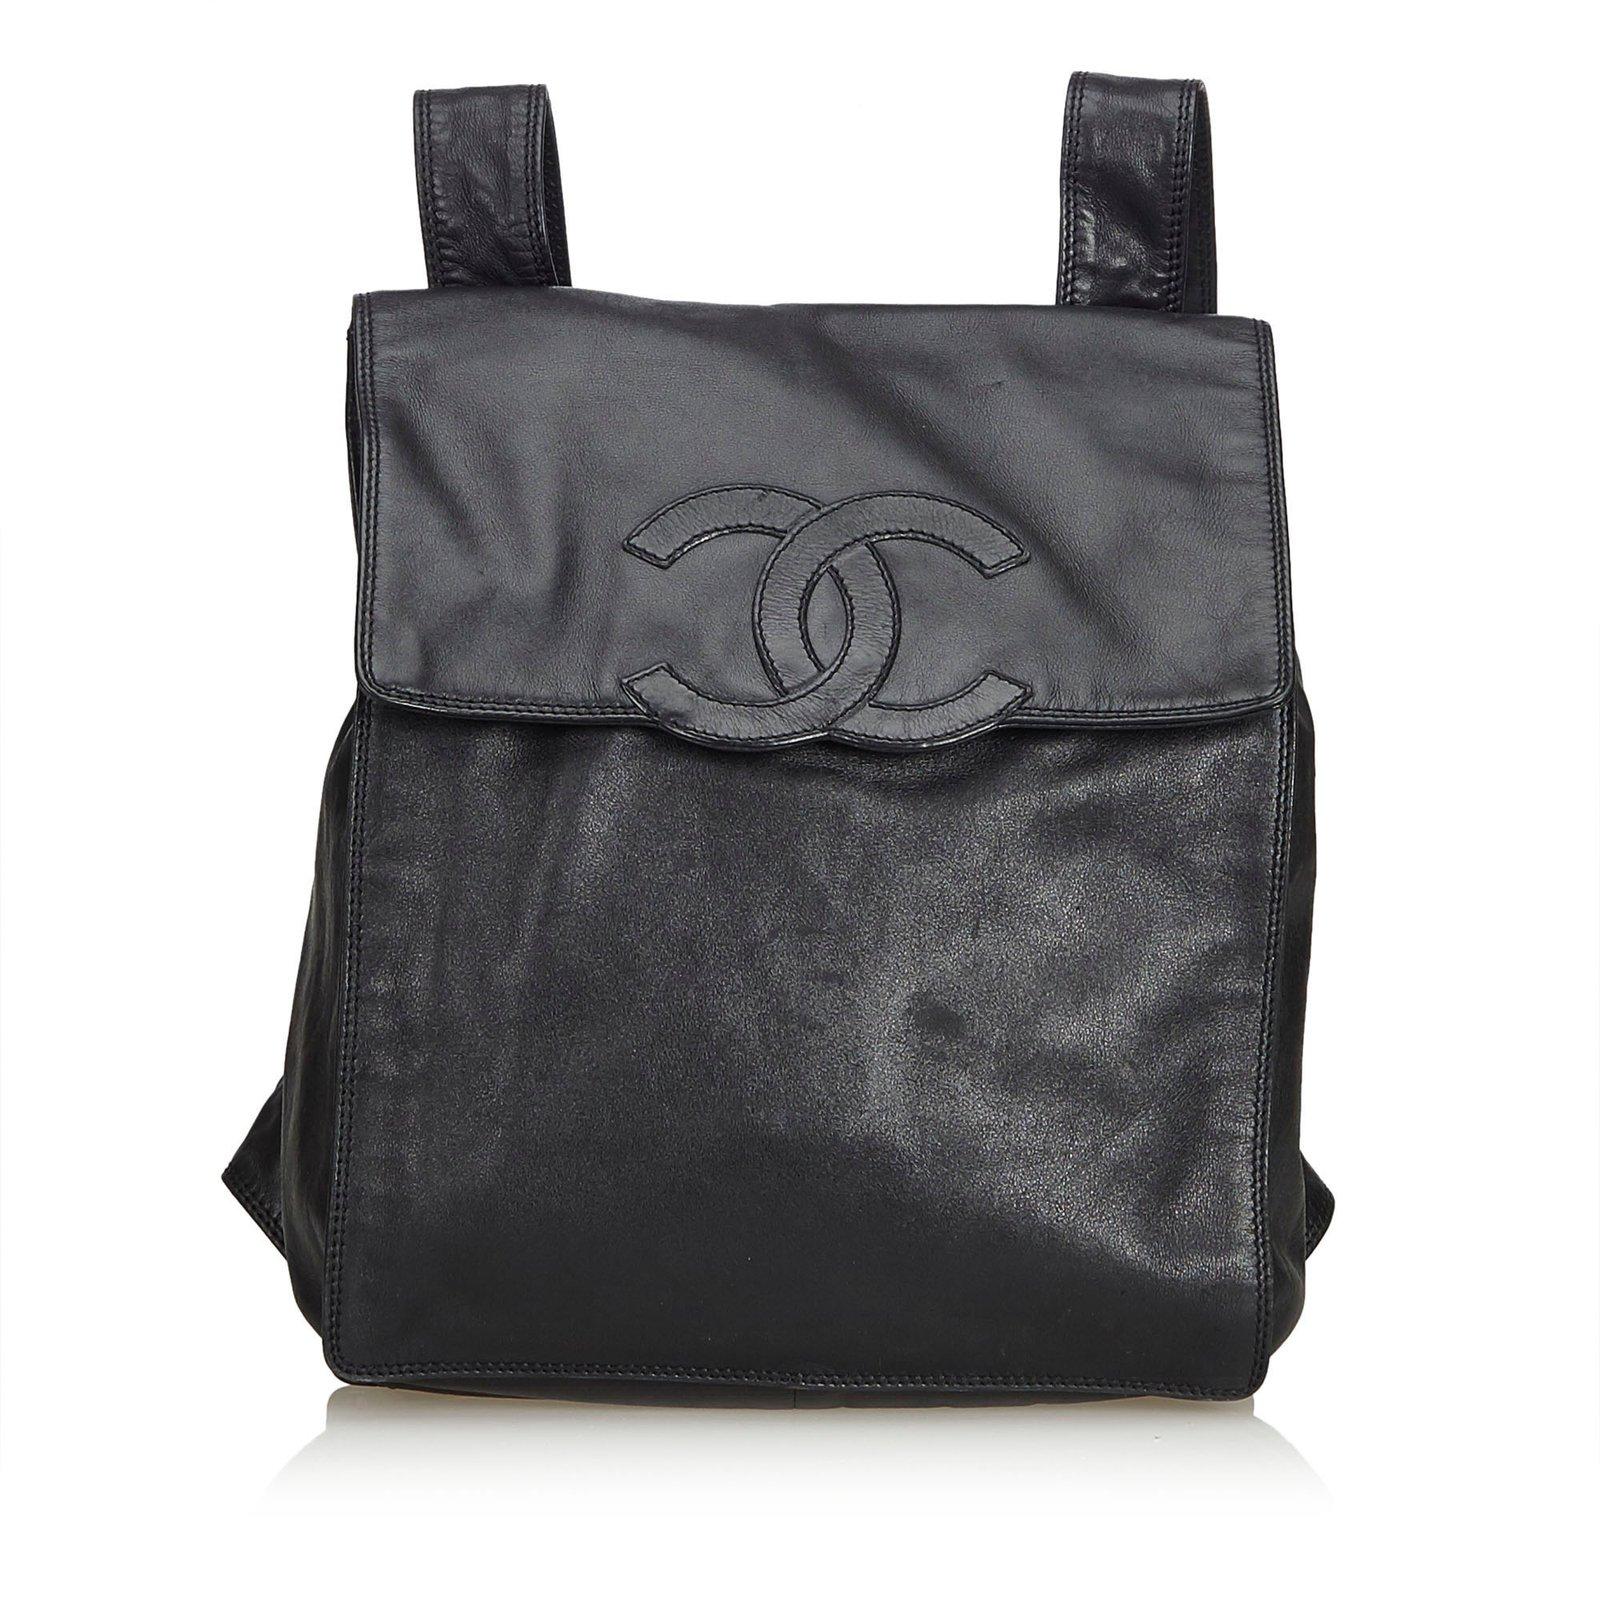 0a8e183e9f Sacs à dos Chanel Sac à dos en cuir d'agneau Cuir Noir ref.93507 ...